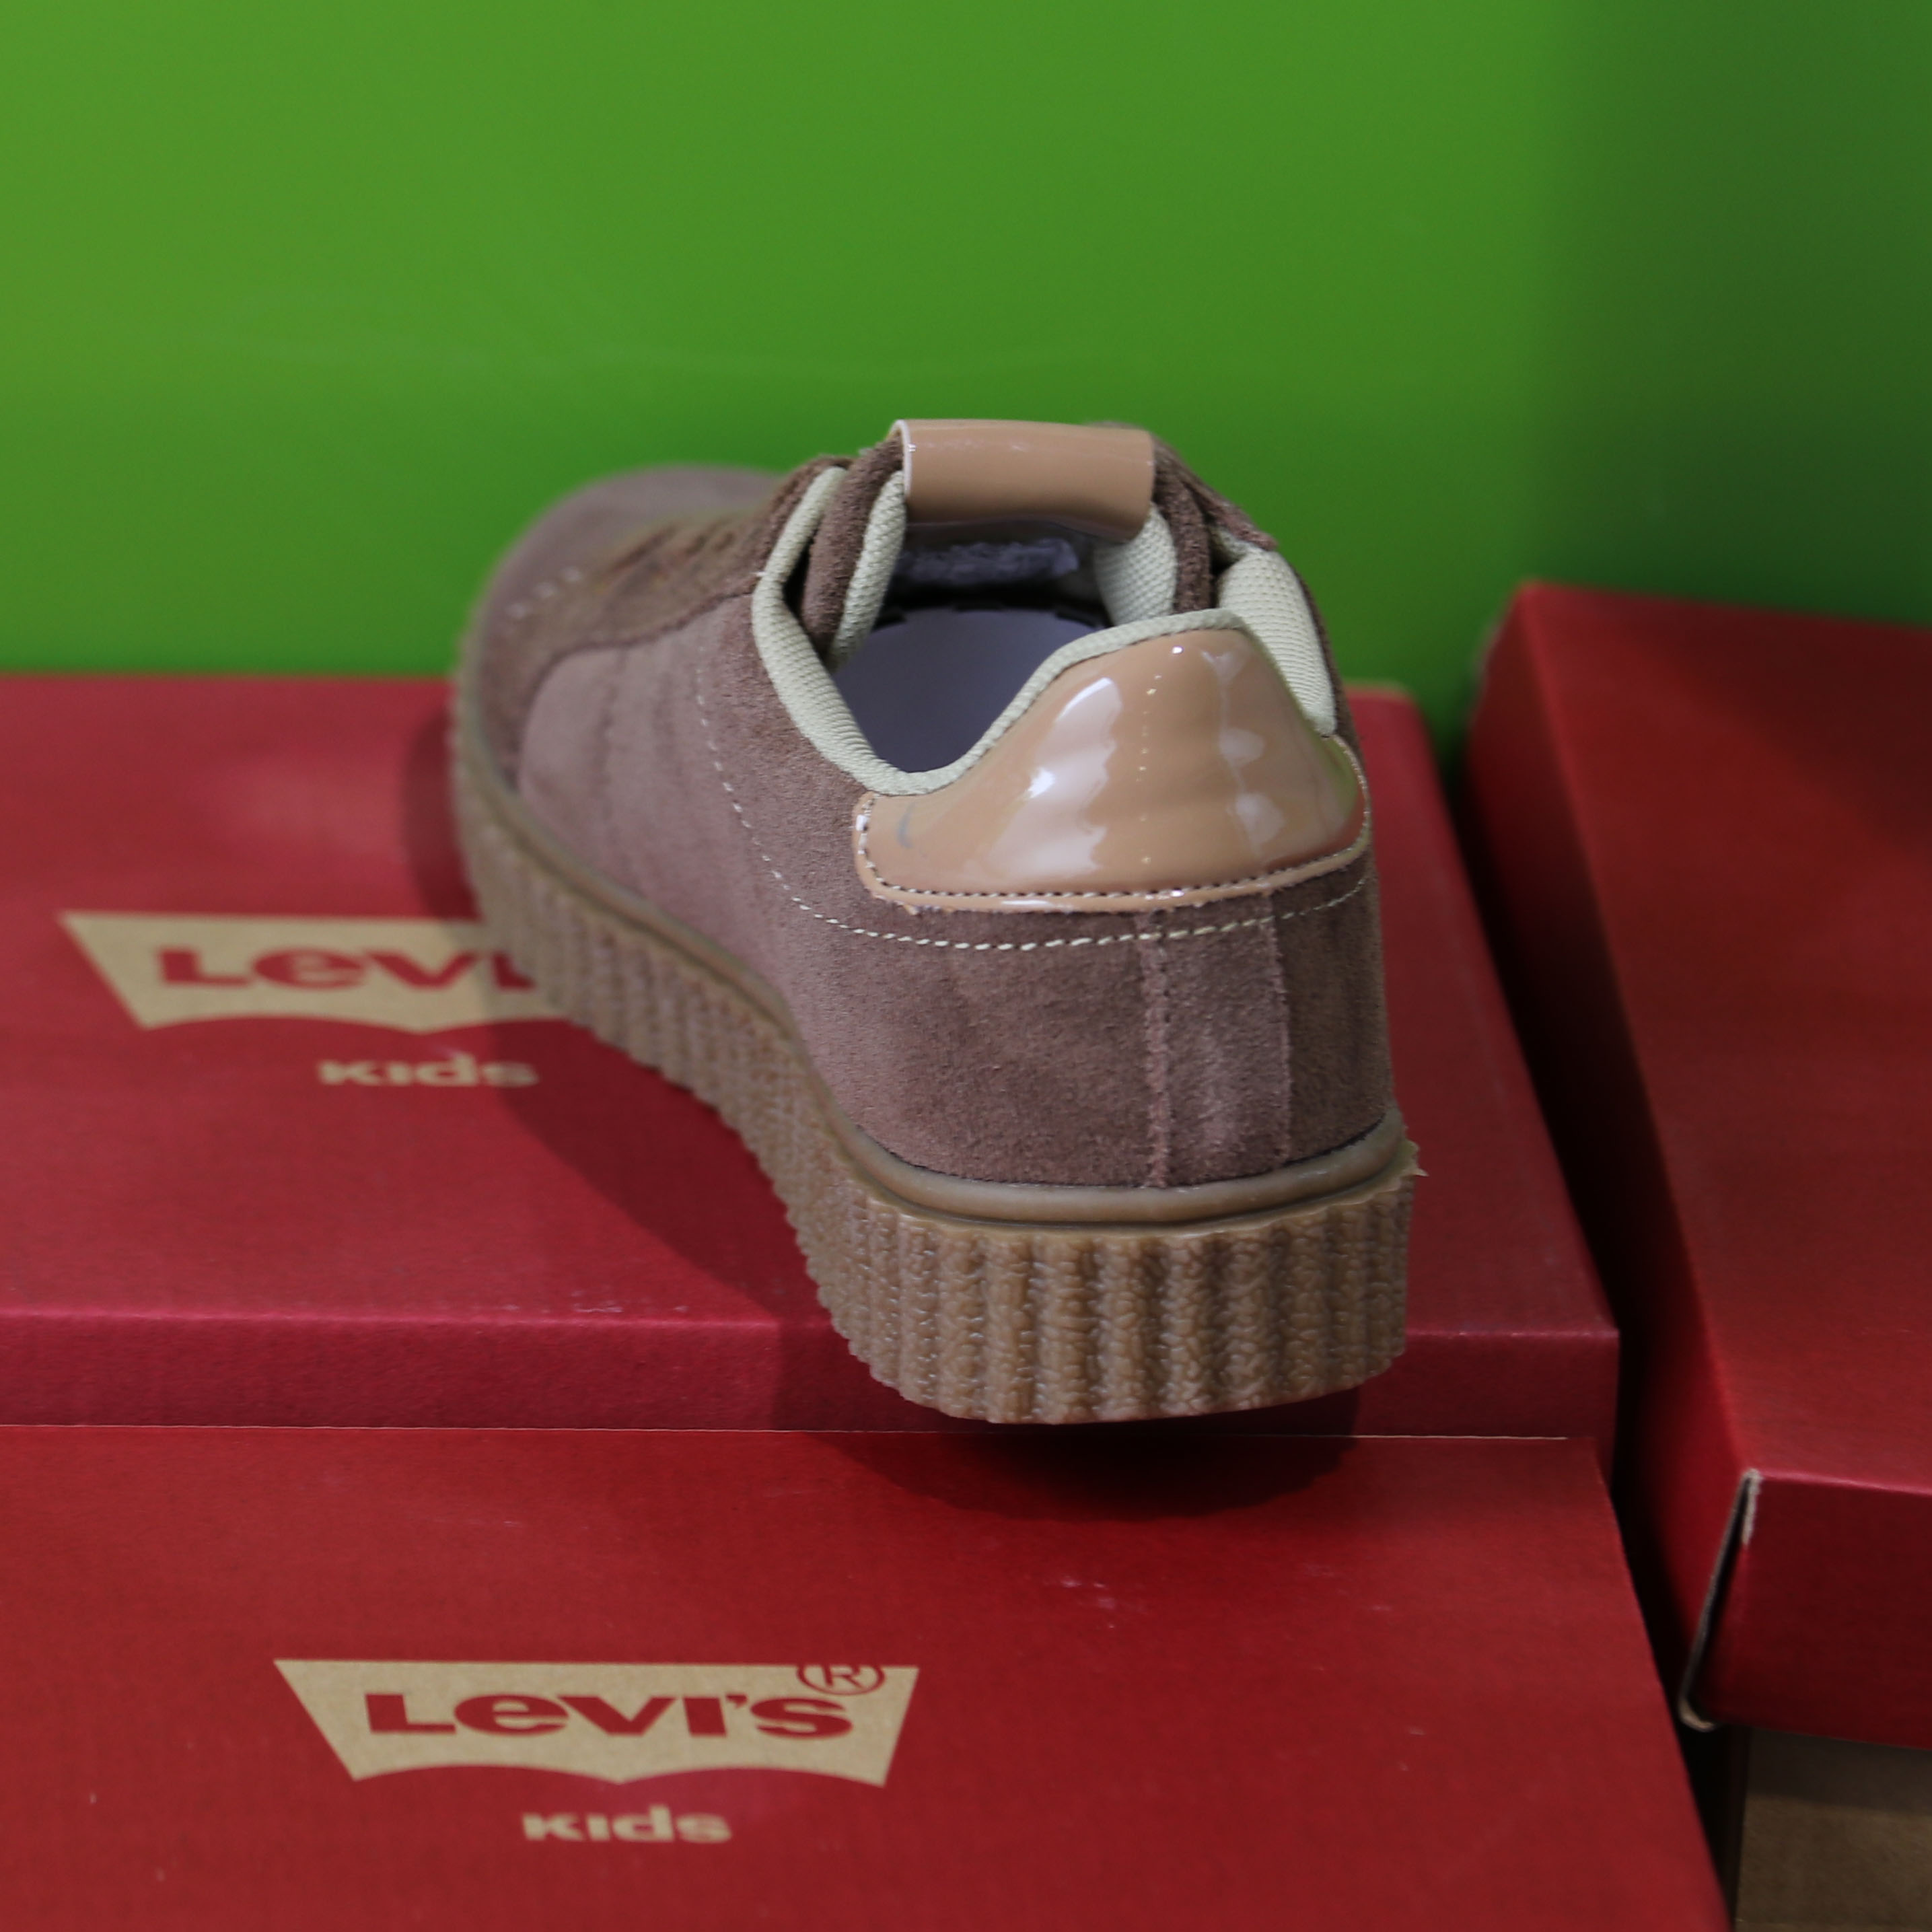 levis kids – new england brun sko barn dame sneakers4